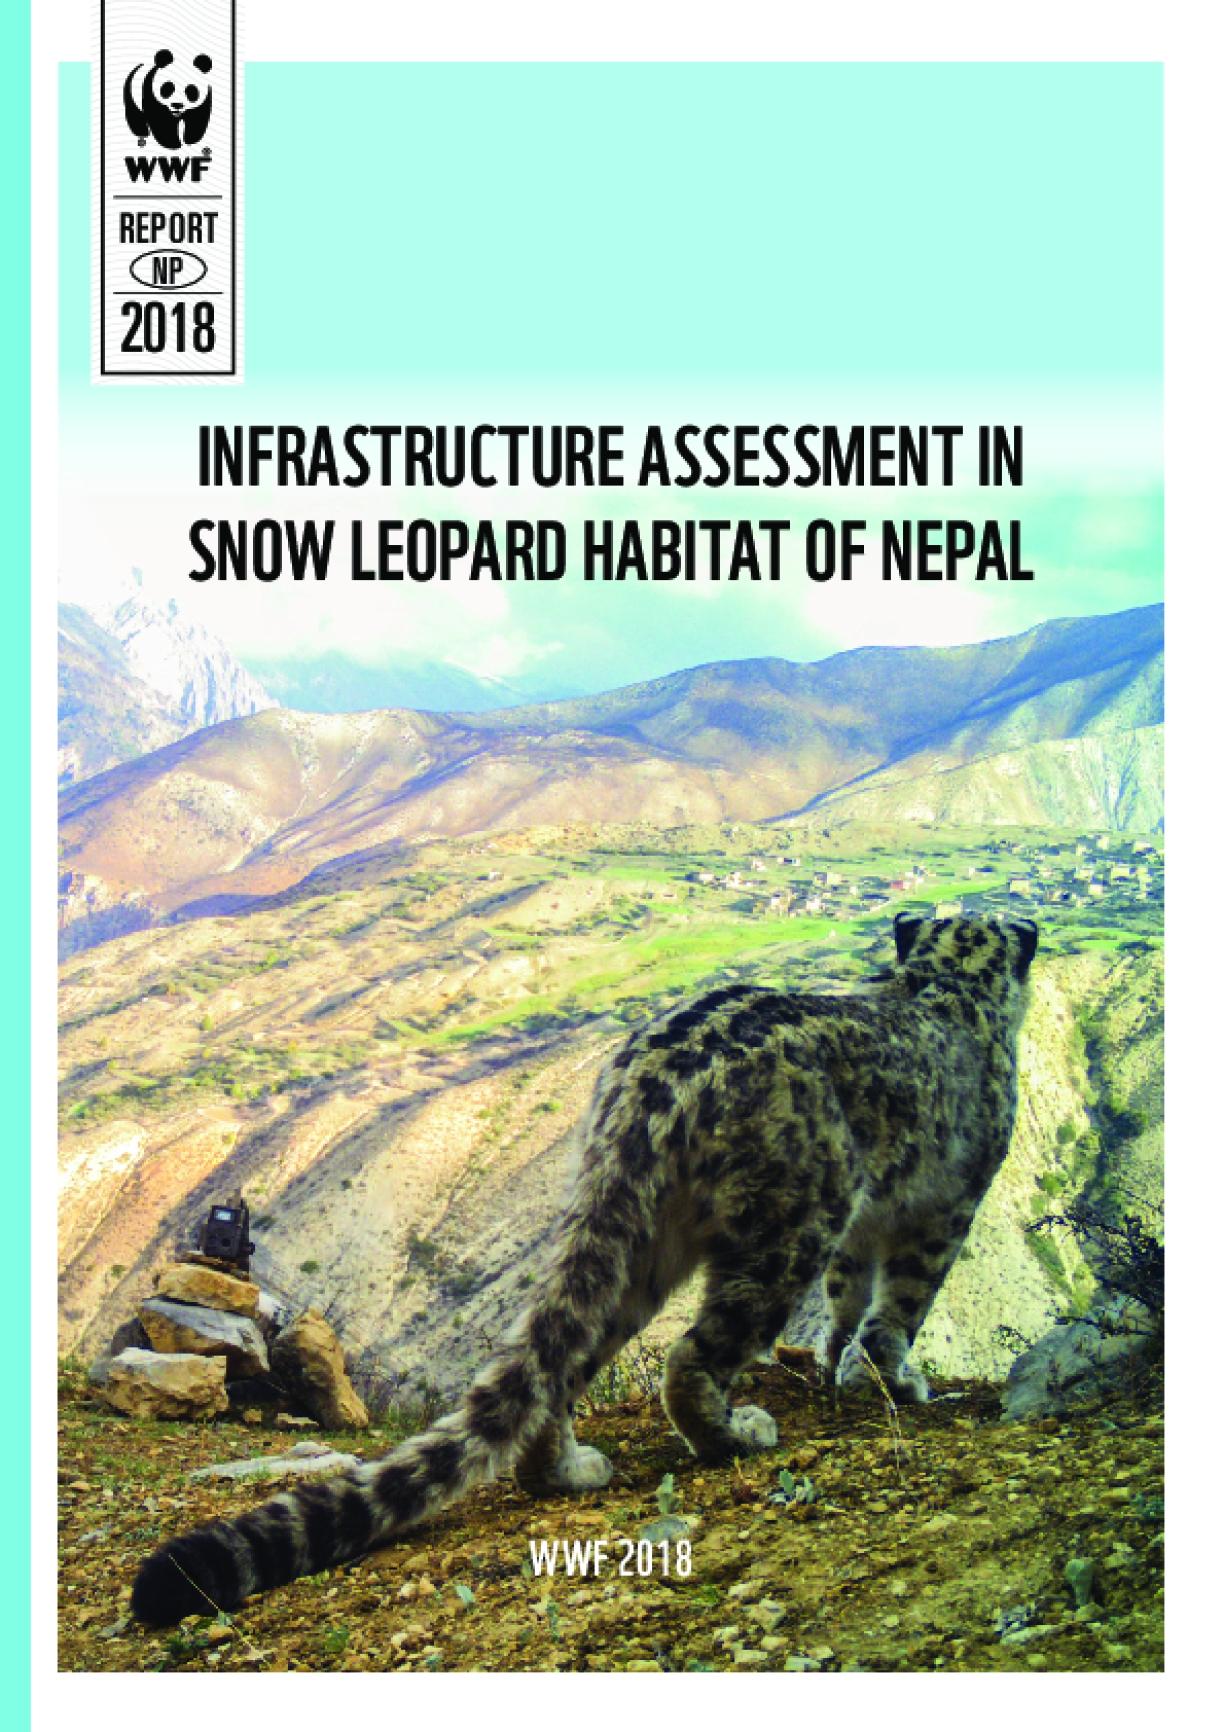 Infrastructure Assessment in Snow Leopard Habitat of Nepal